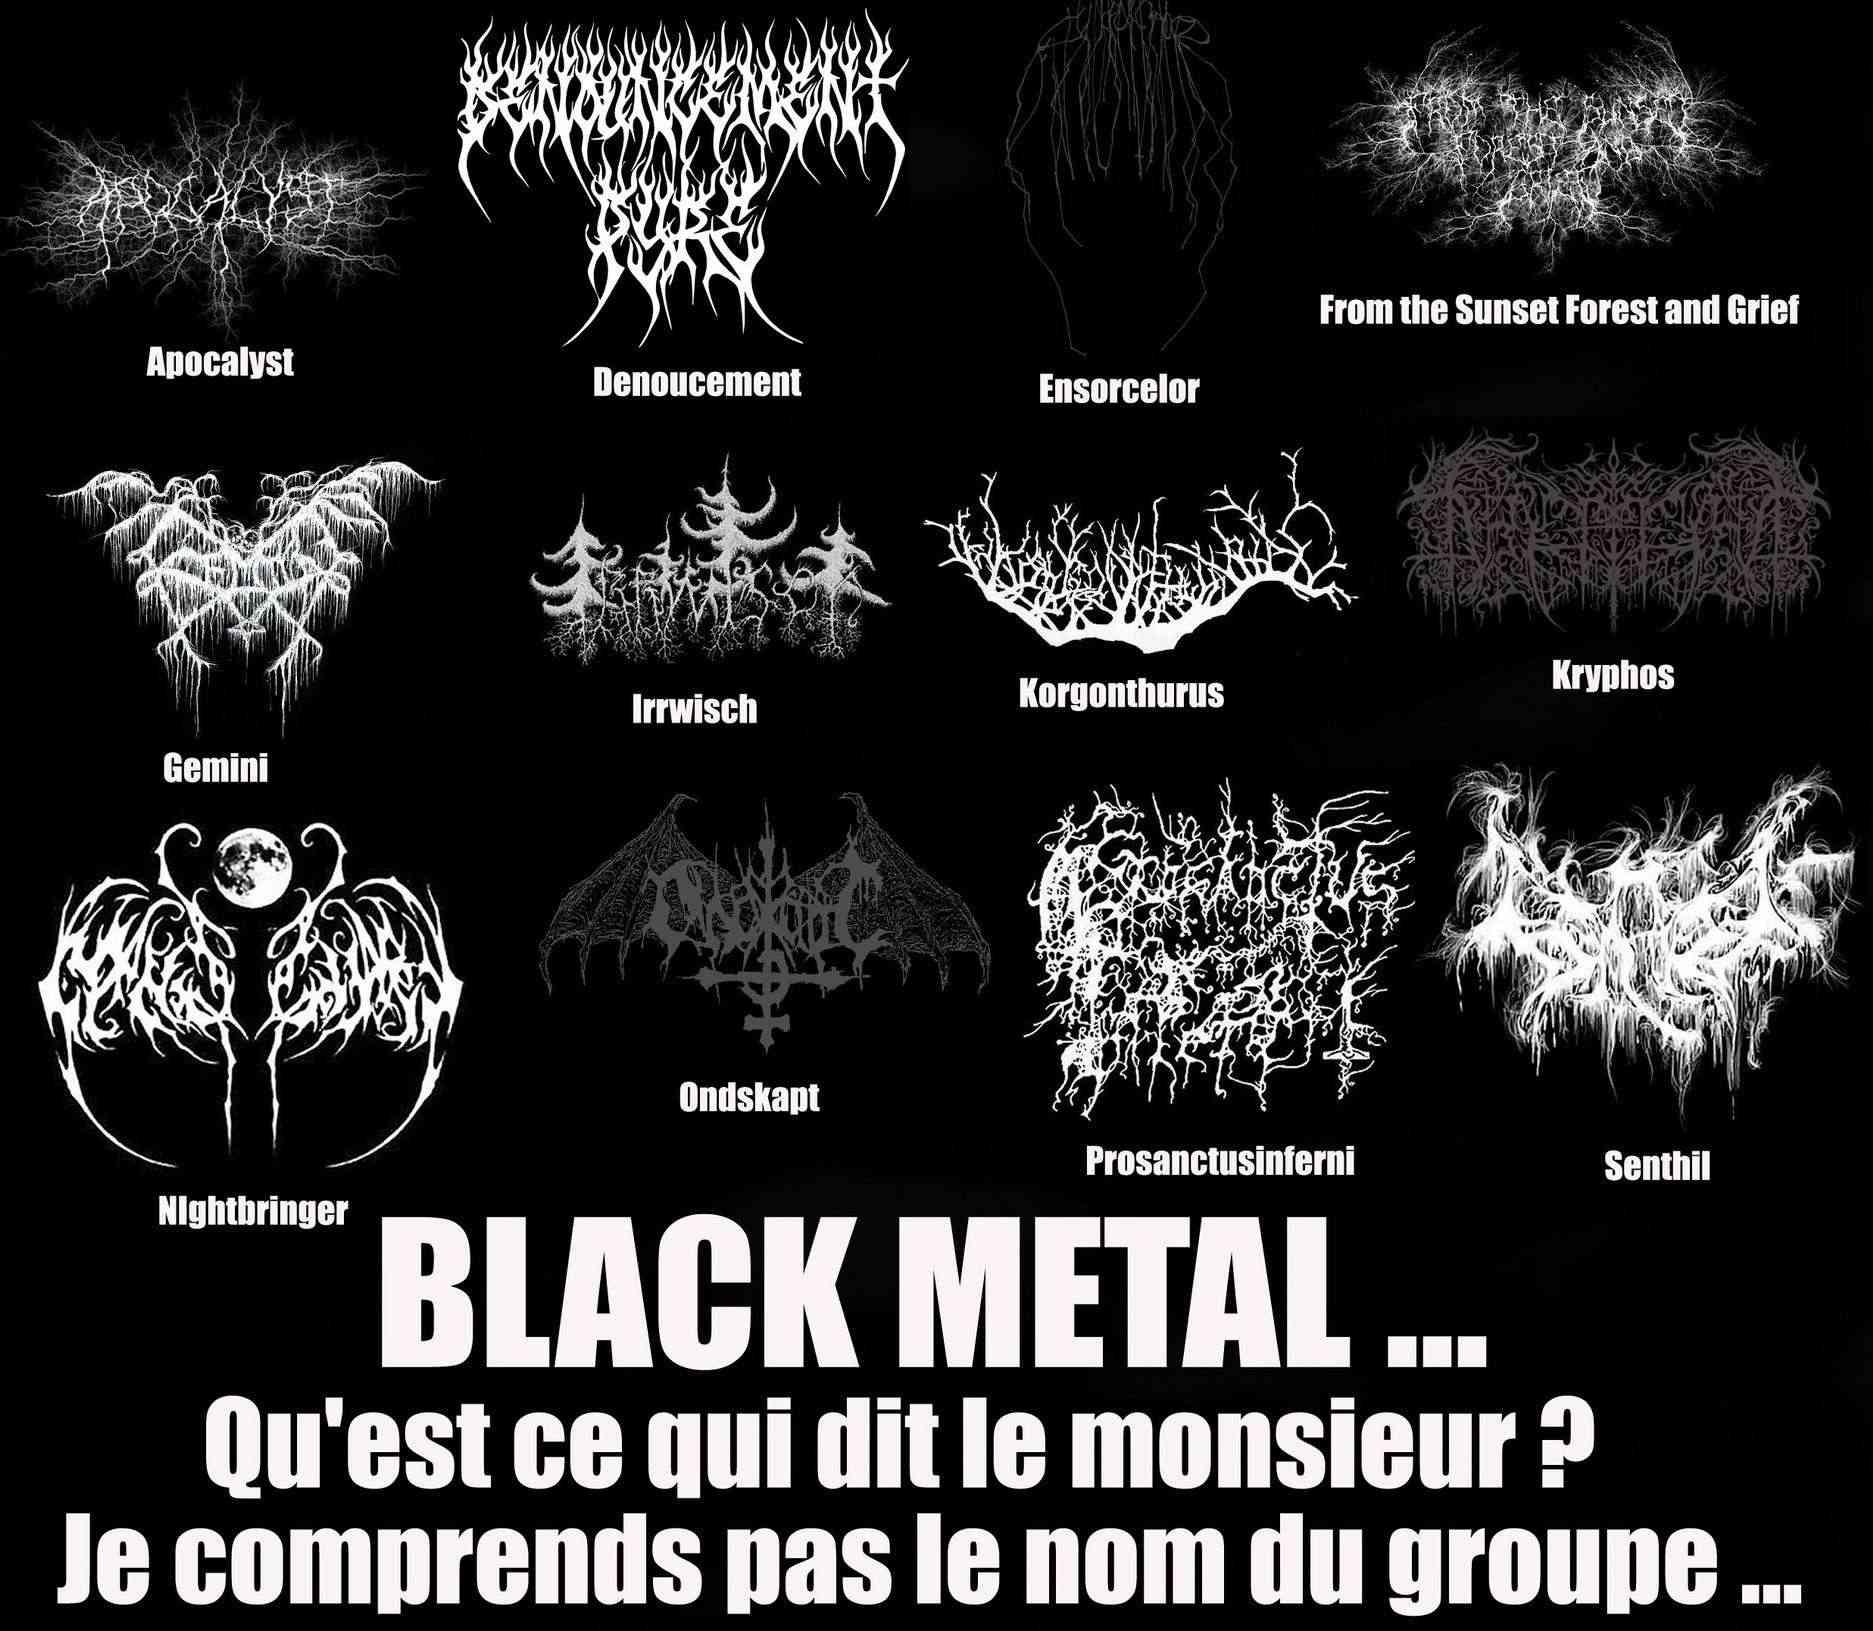 Le nom des groupes de BLACK METAL incompréhensibles ... Black_15